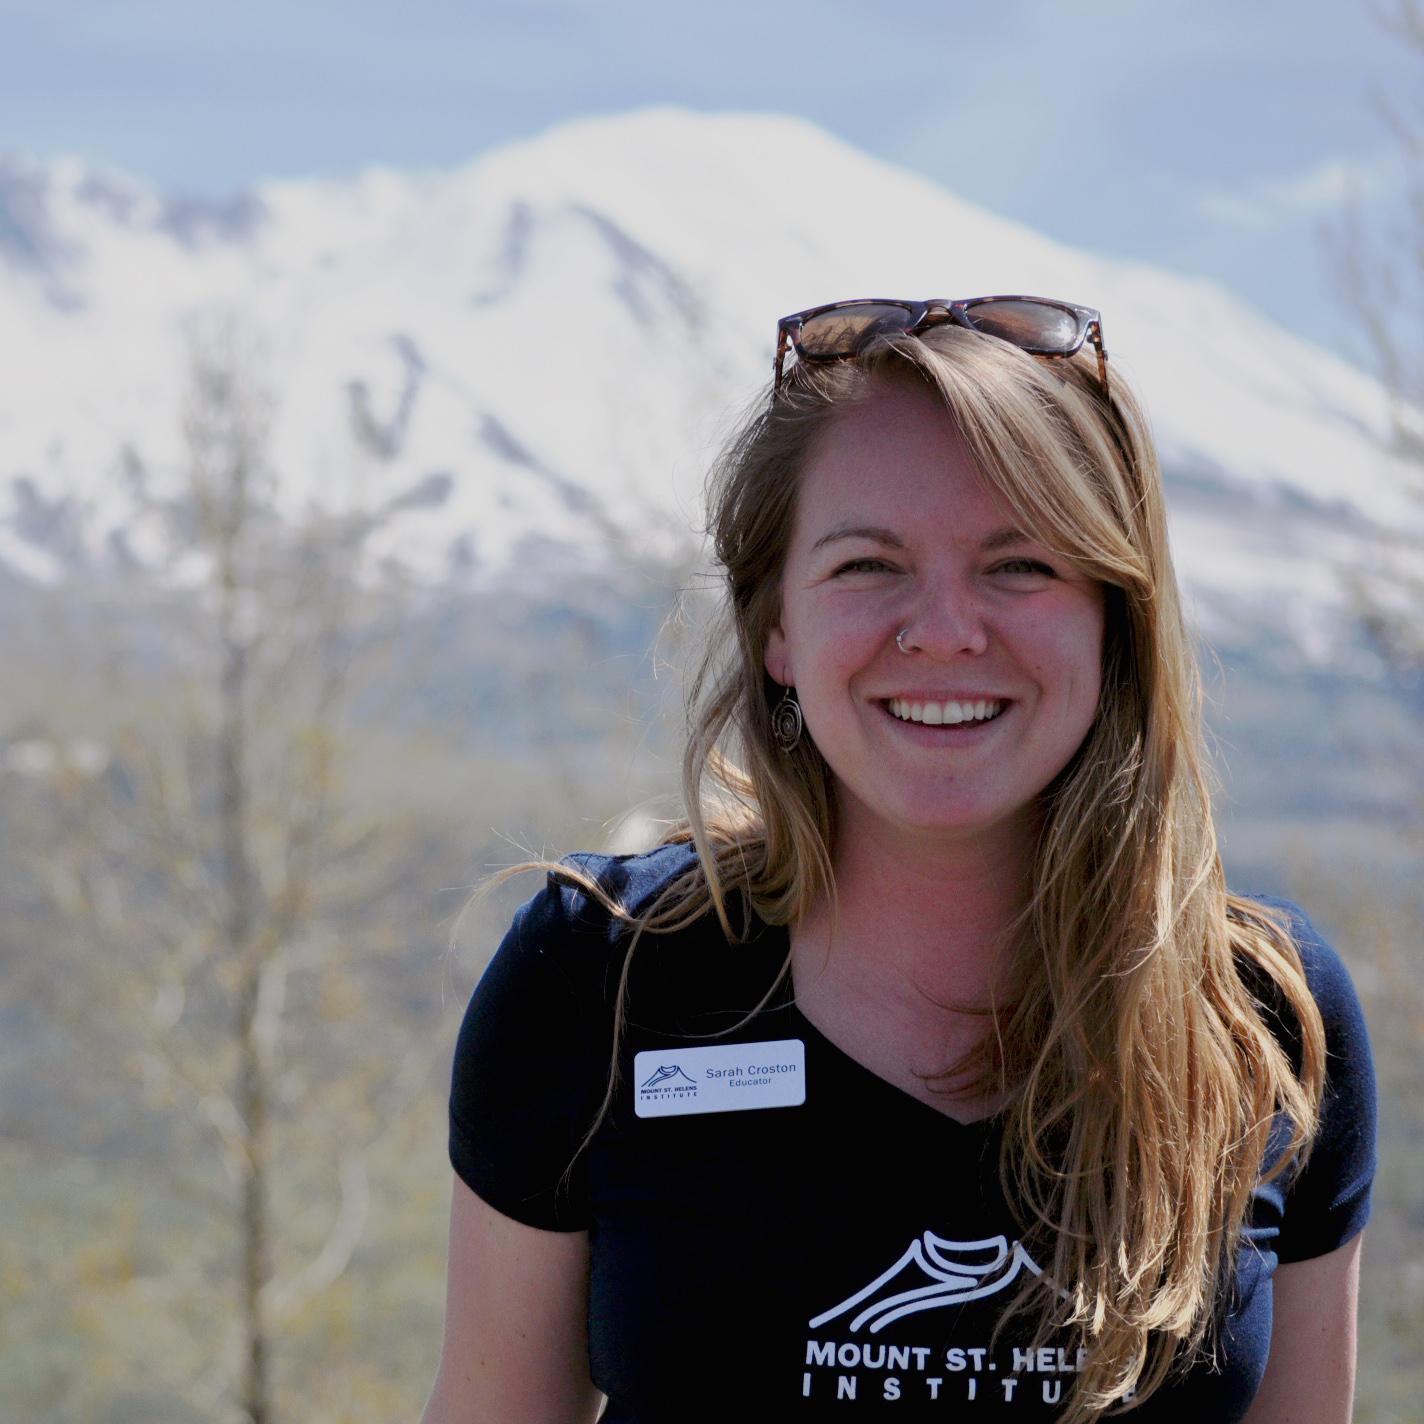 SARAH CROSTON, Assistant Guide